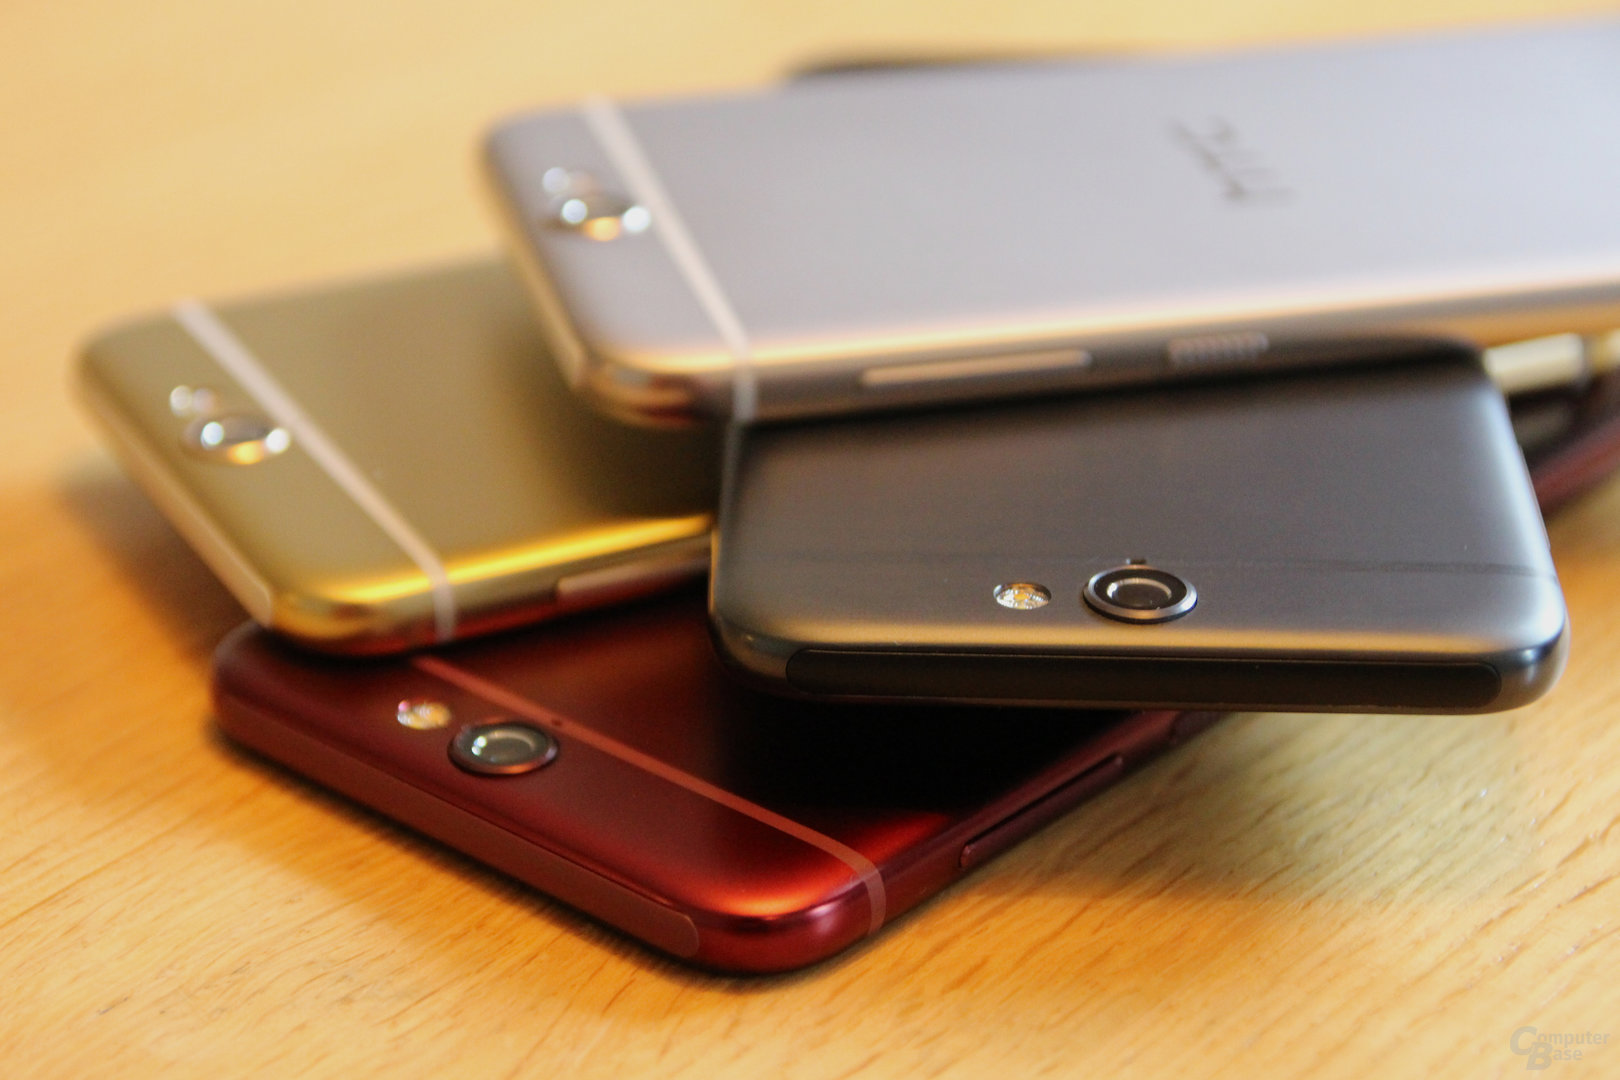 HTC One A9 in Opal Silver, Carbon Grey, Topaz Gold, Deep Garnet